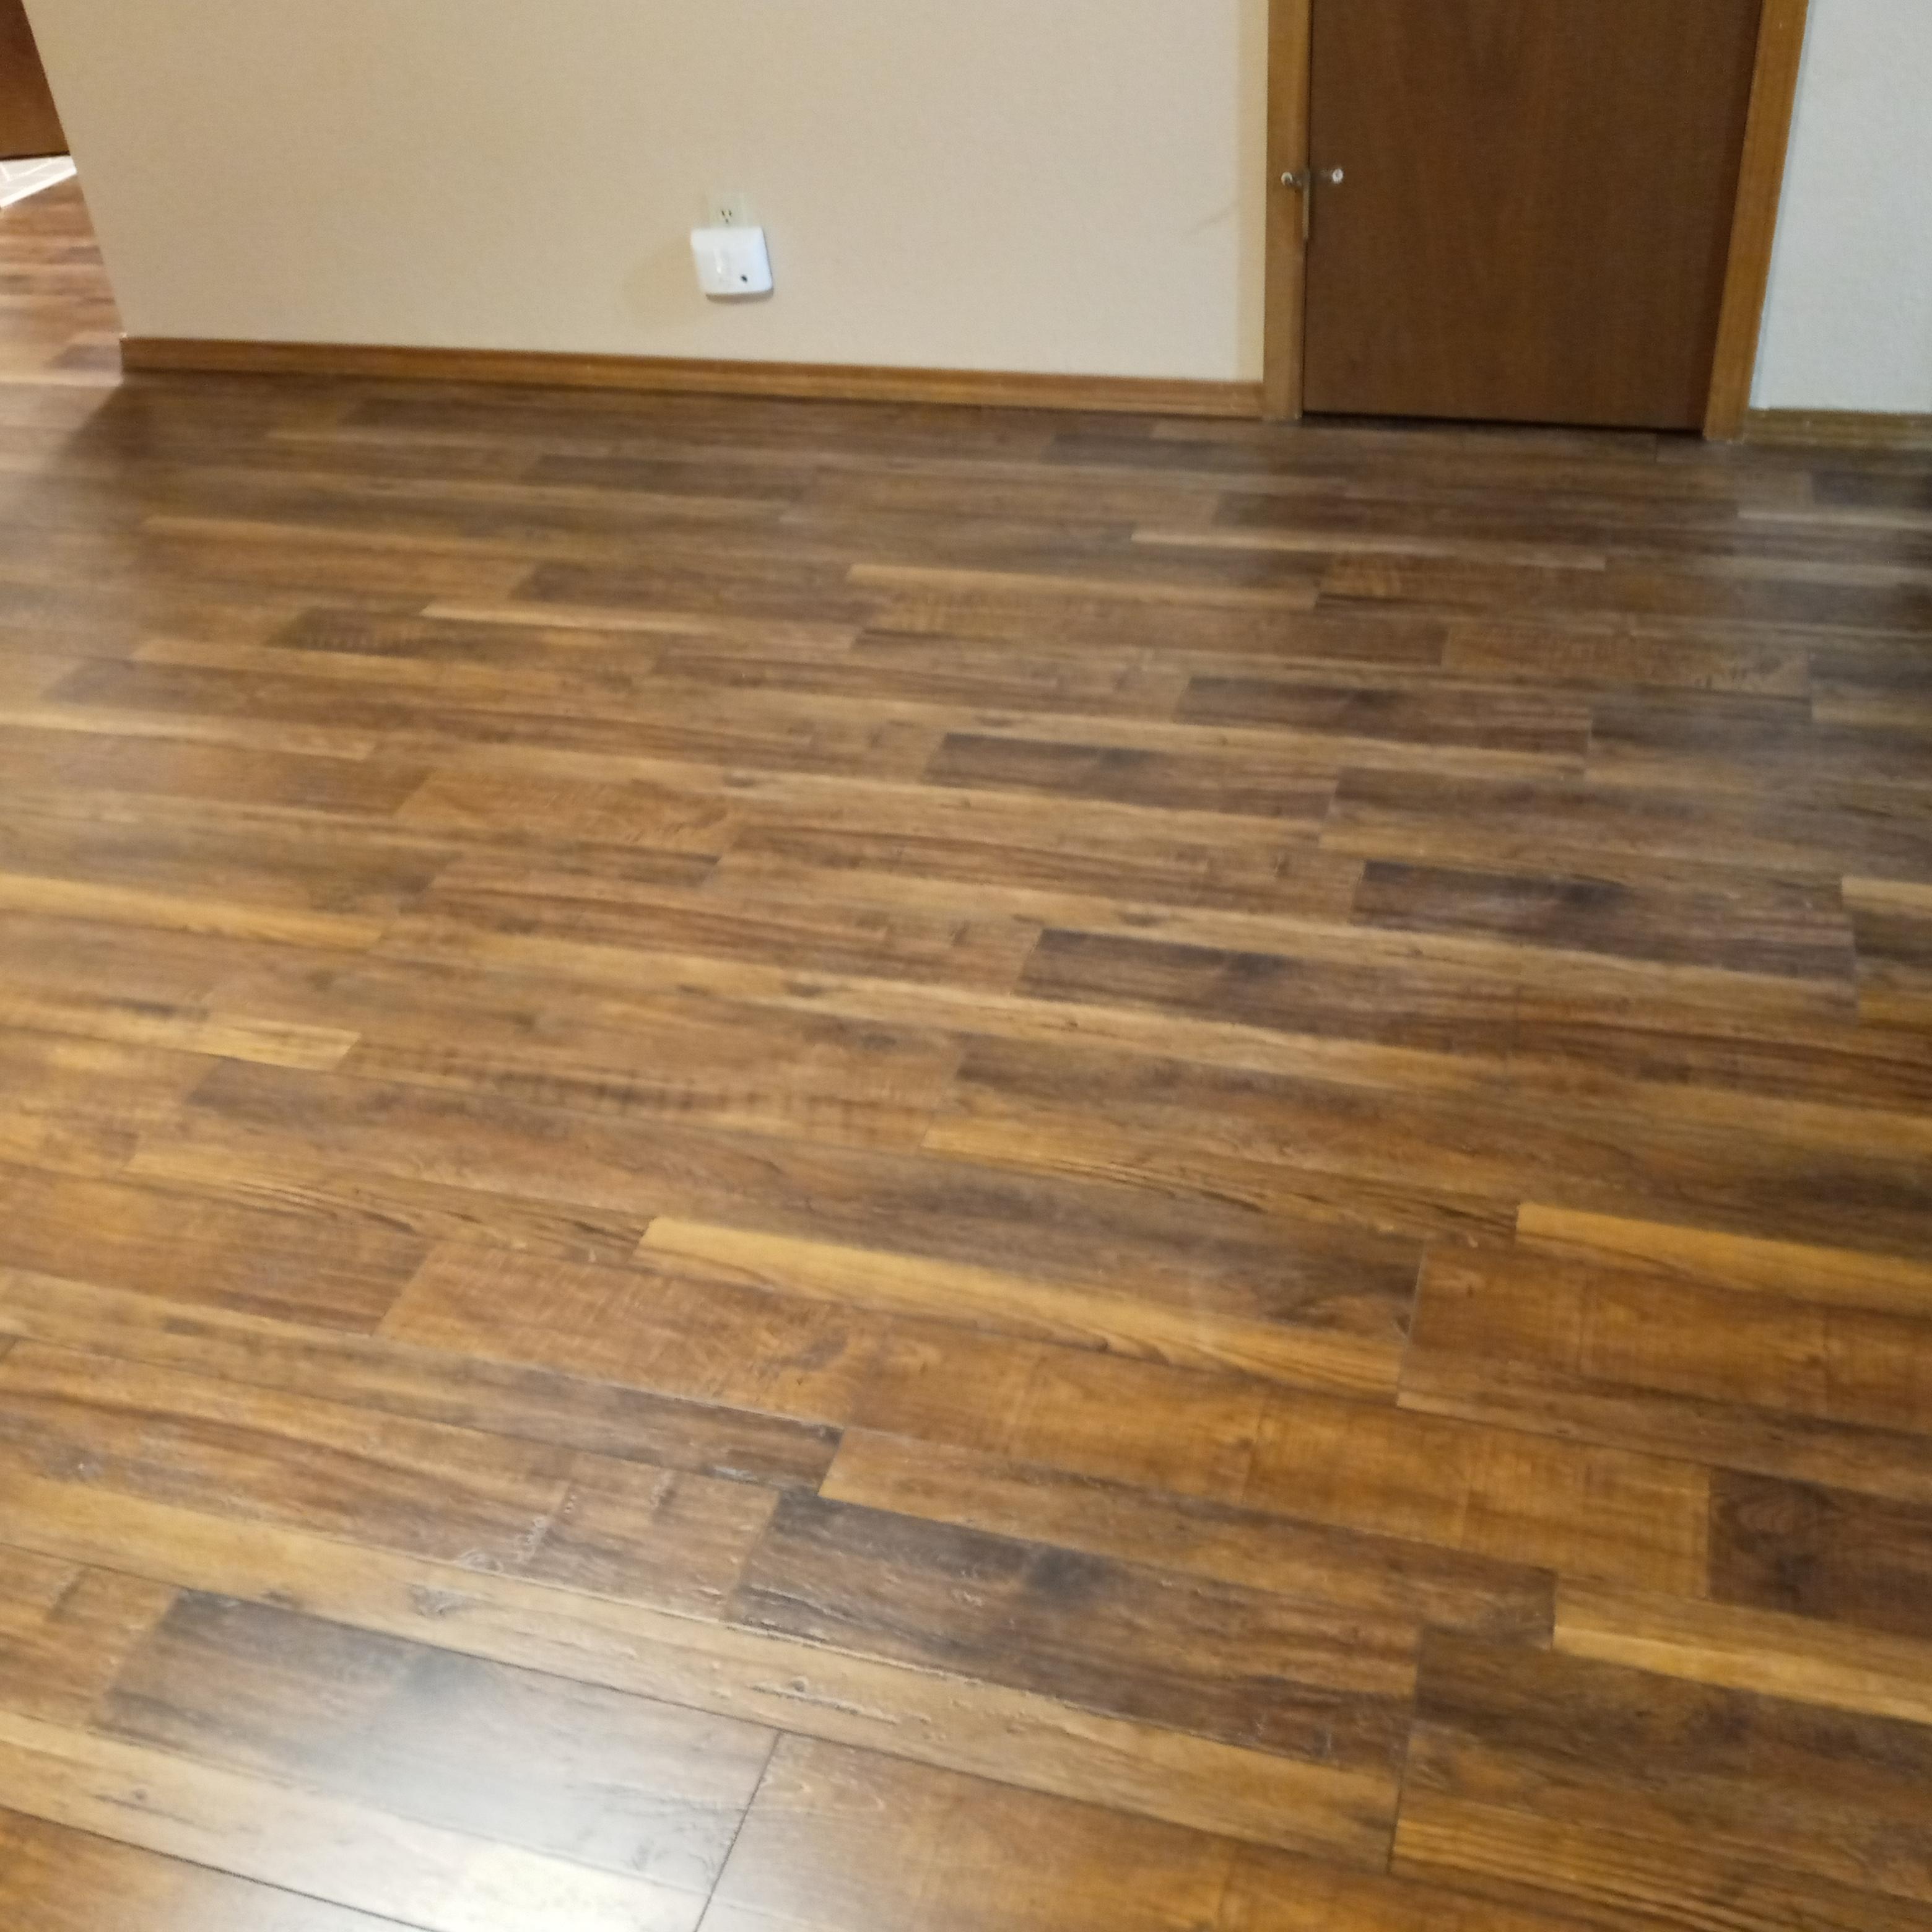 Tile & Flooring by James